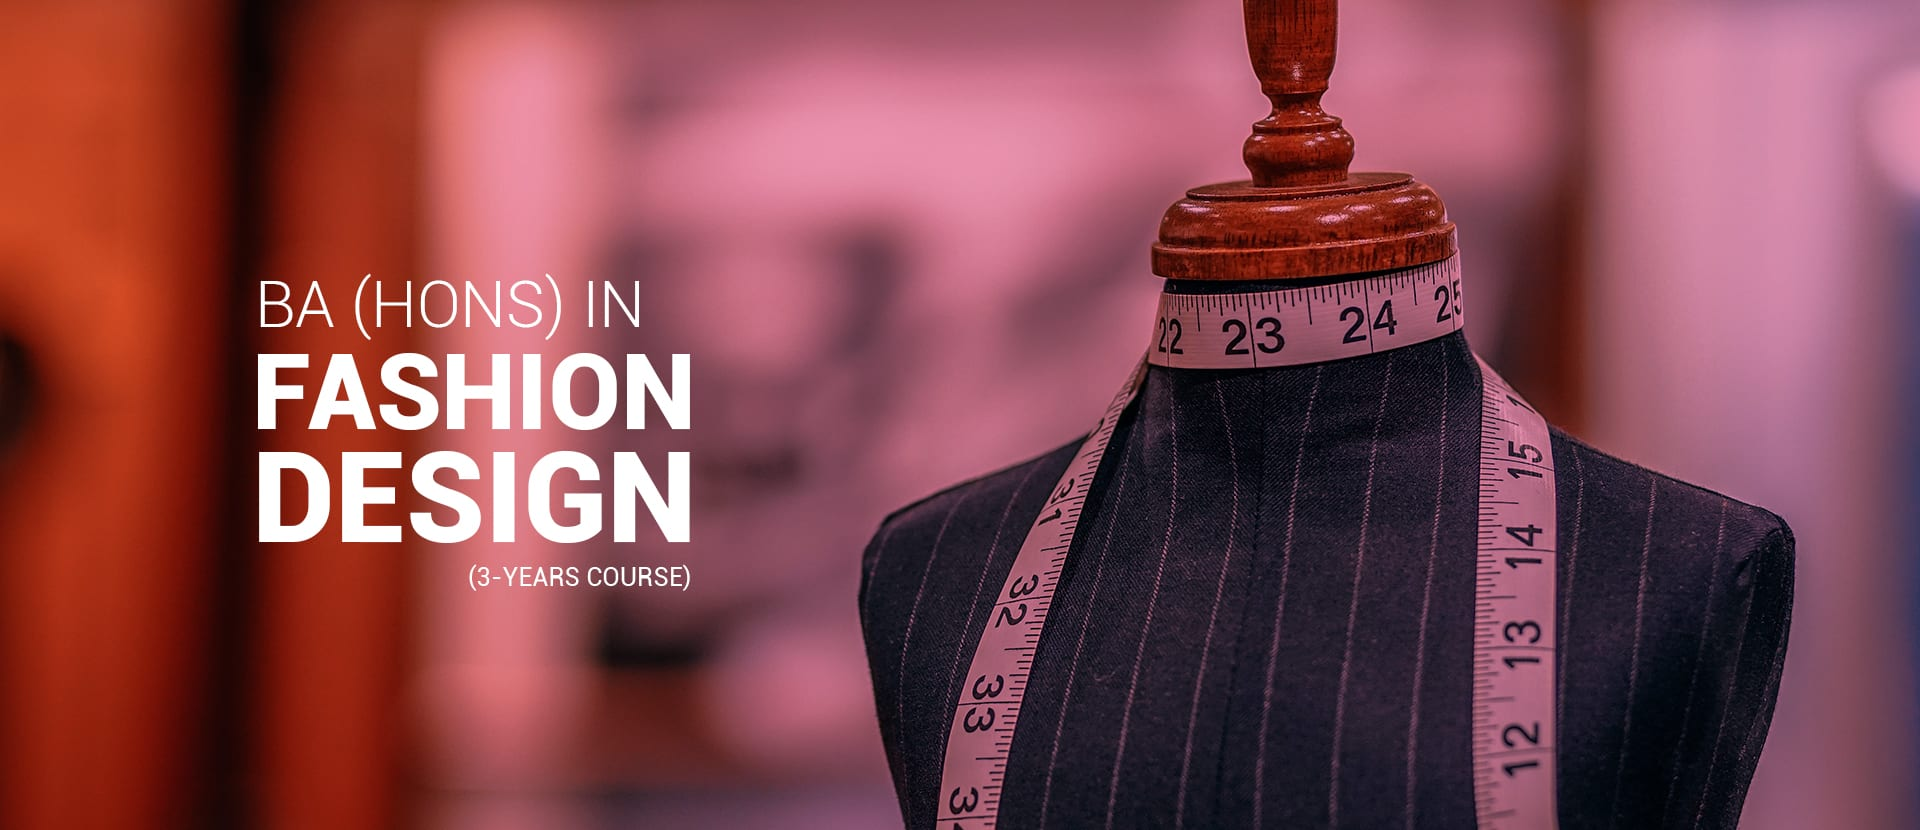 BA (Hons) In Fashion Design